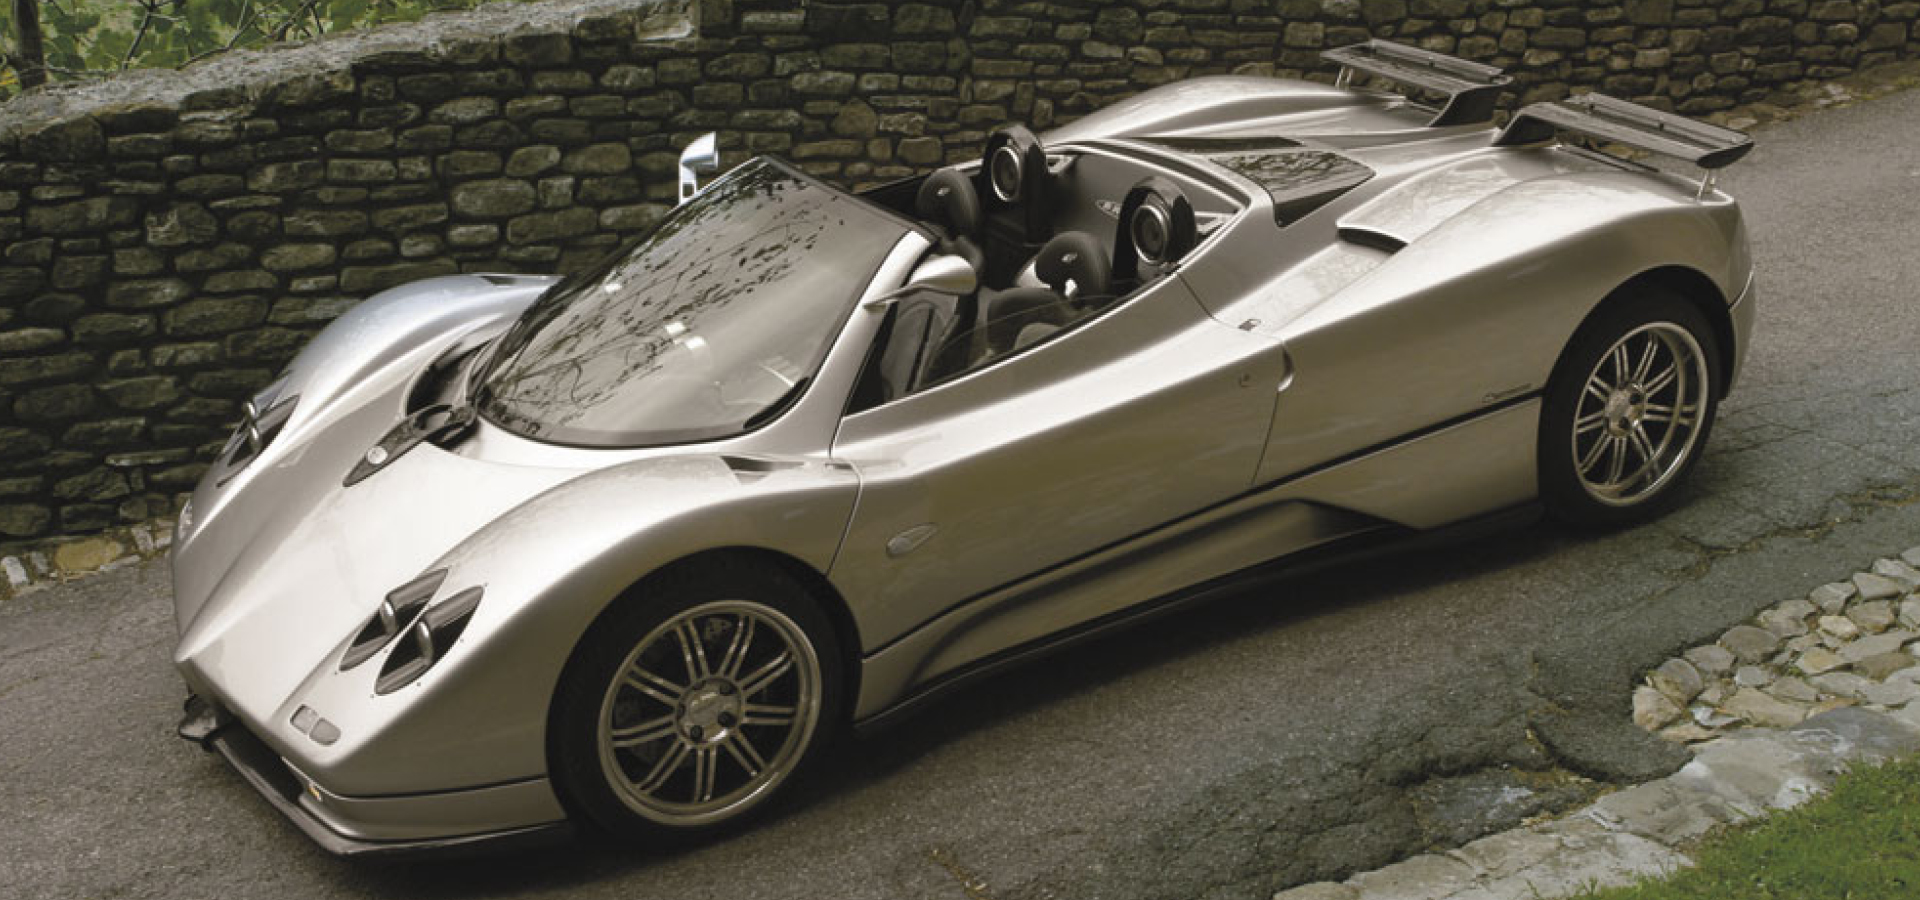 Morel Pagani Automobili Partnership Morel